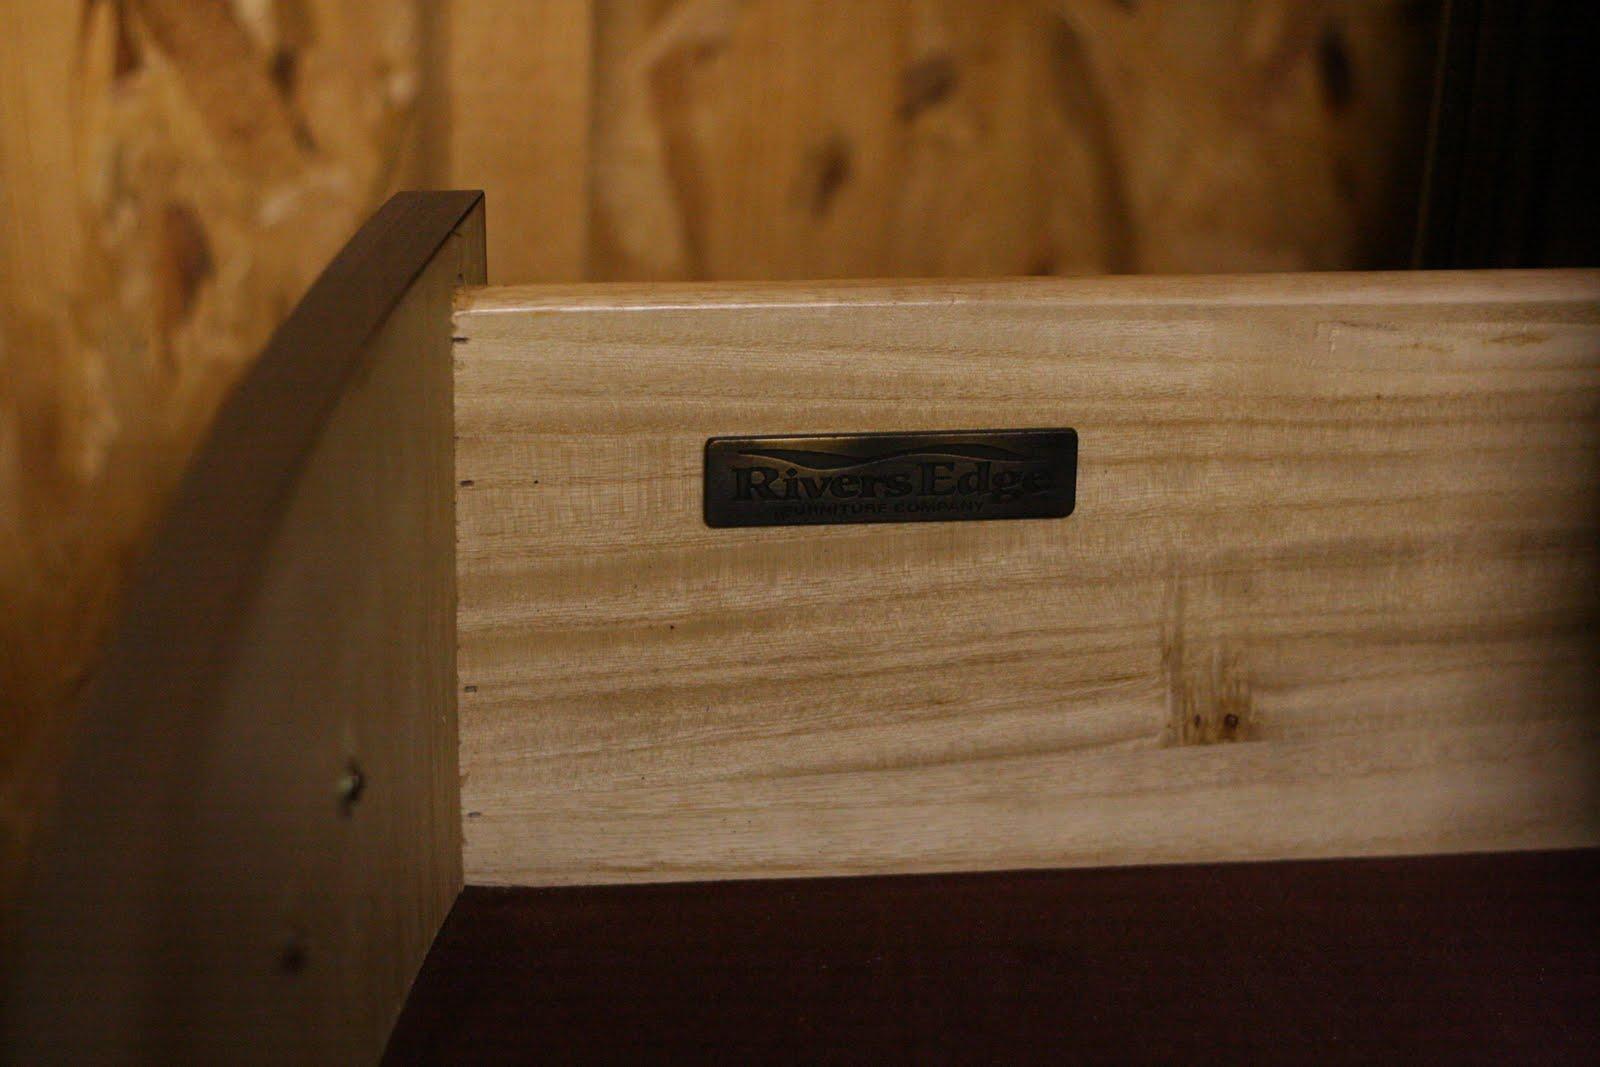 CRAIGSLIST Philadelphia PA: new dressers wooden $300 each obo